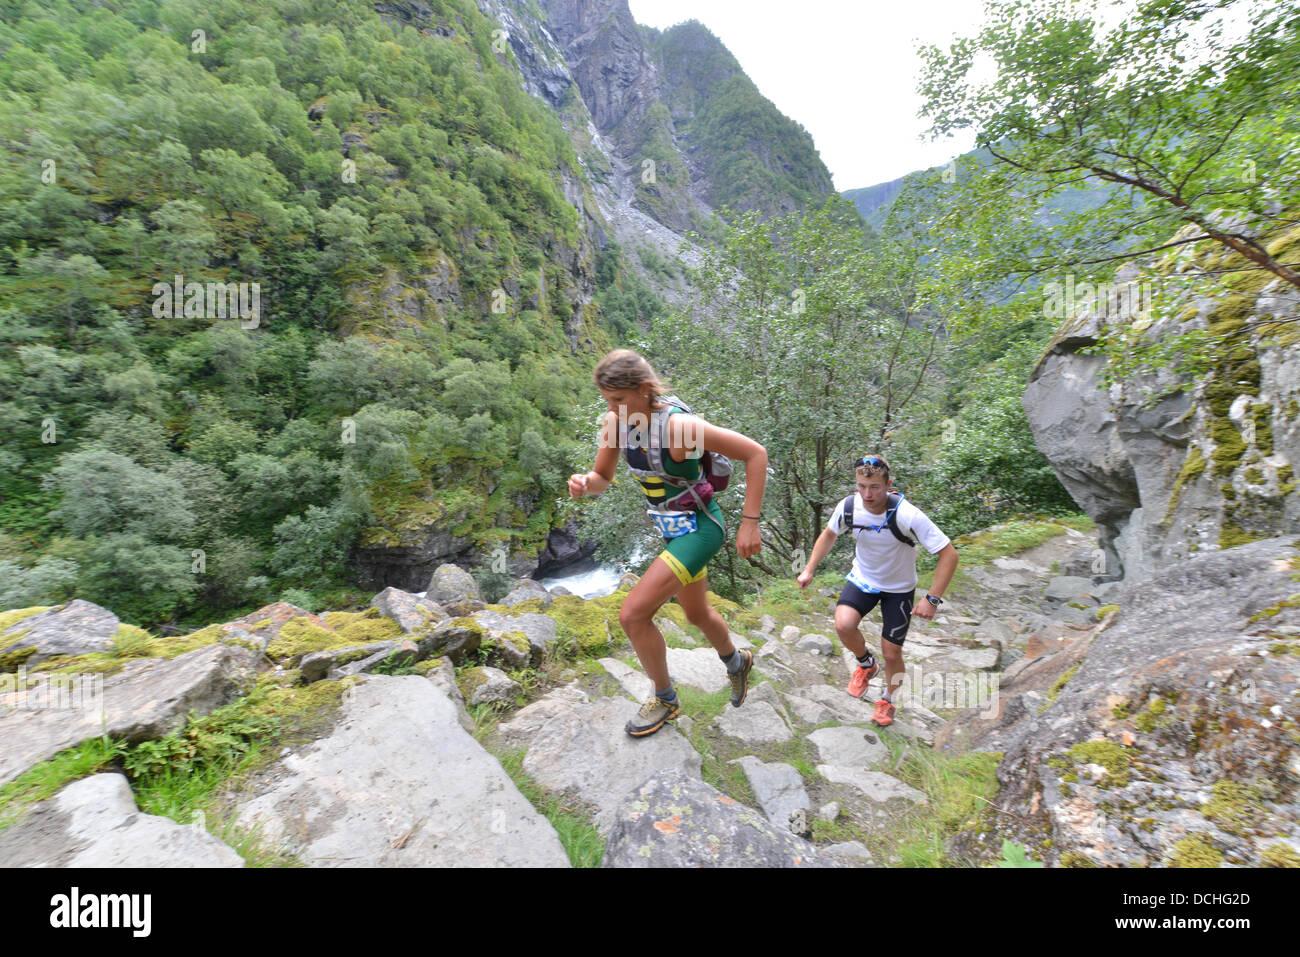 503c9bac1 Aurland, Norway. 17th Aug, 2013. Women's winner of Aurlandsfjellet ...